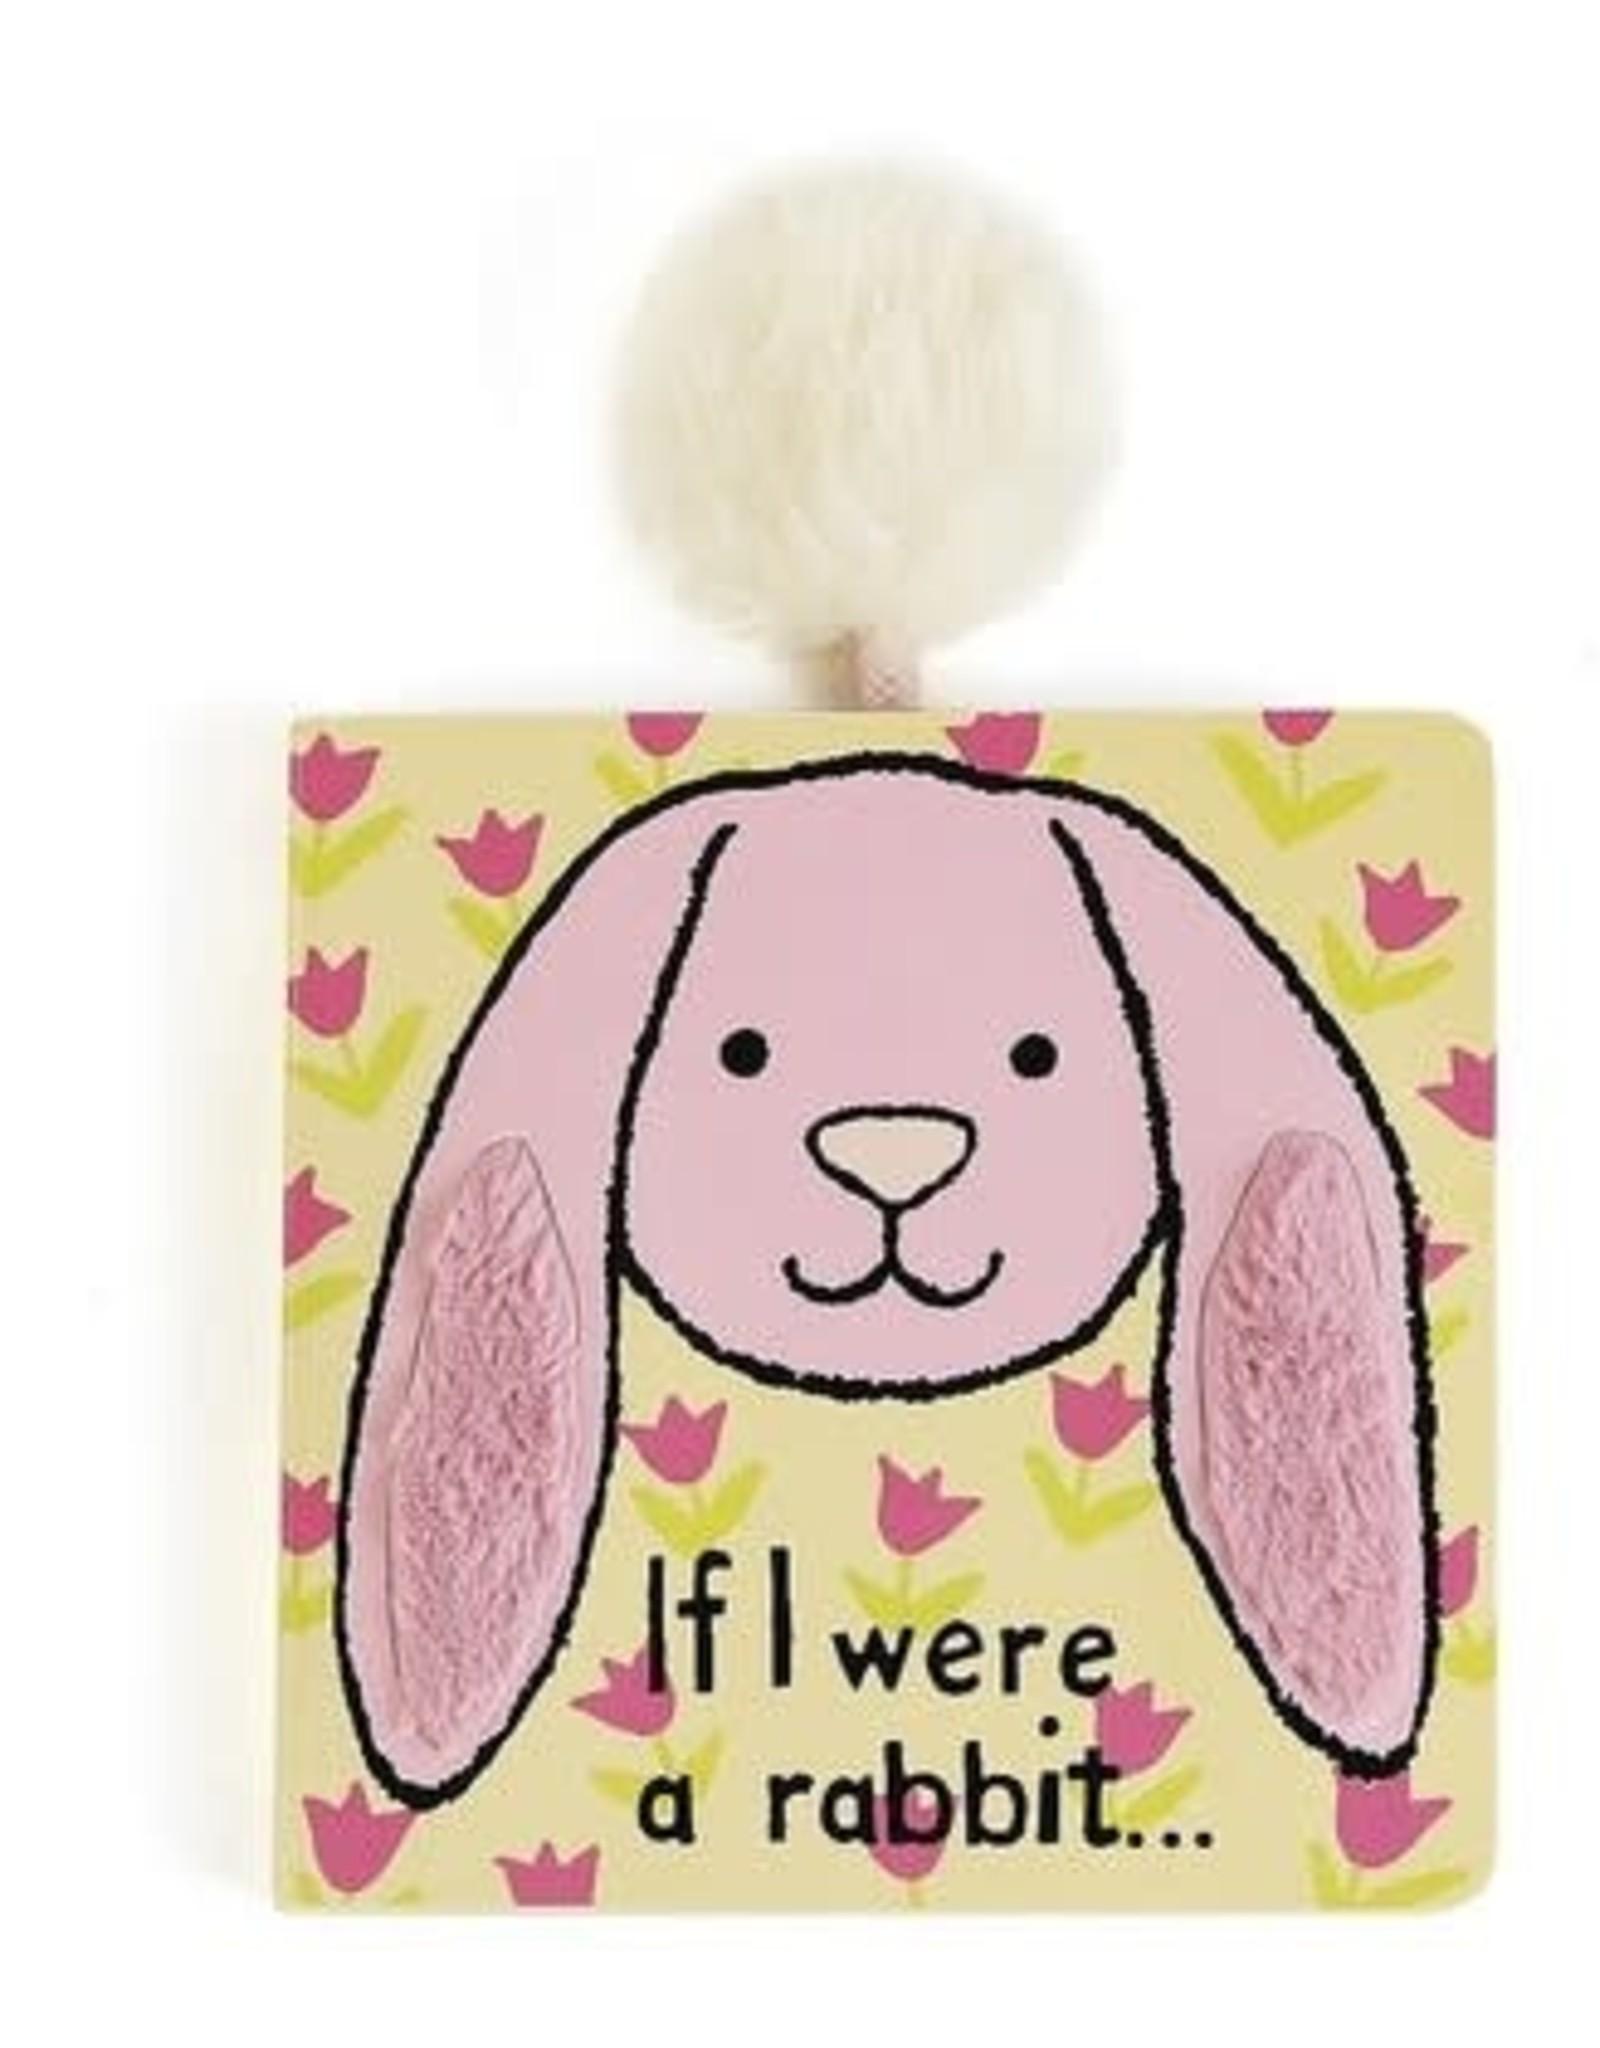 Jellycat If I Were a Rabbit Book